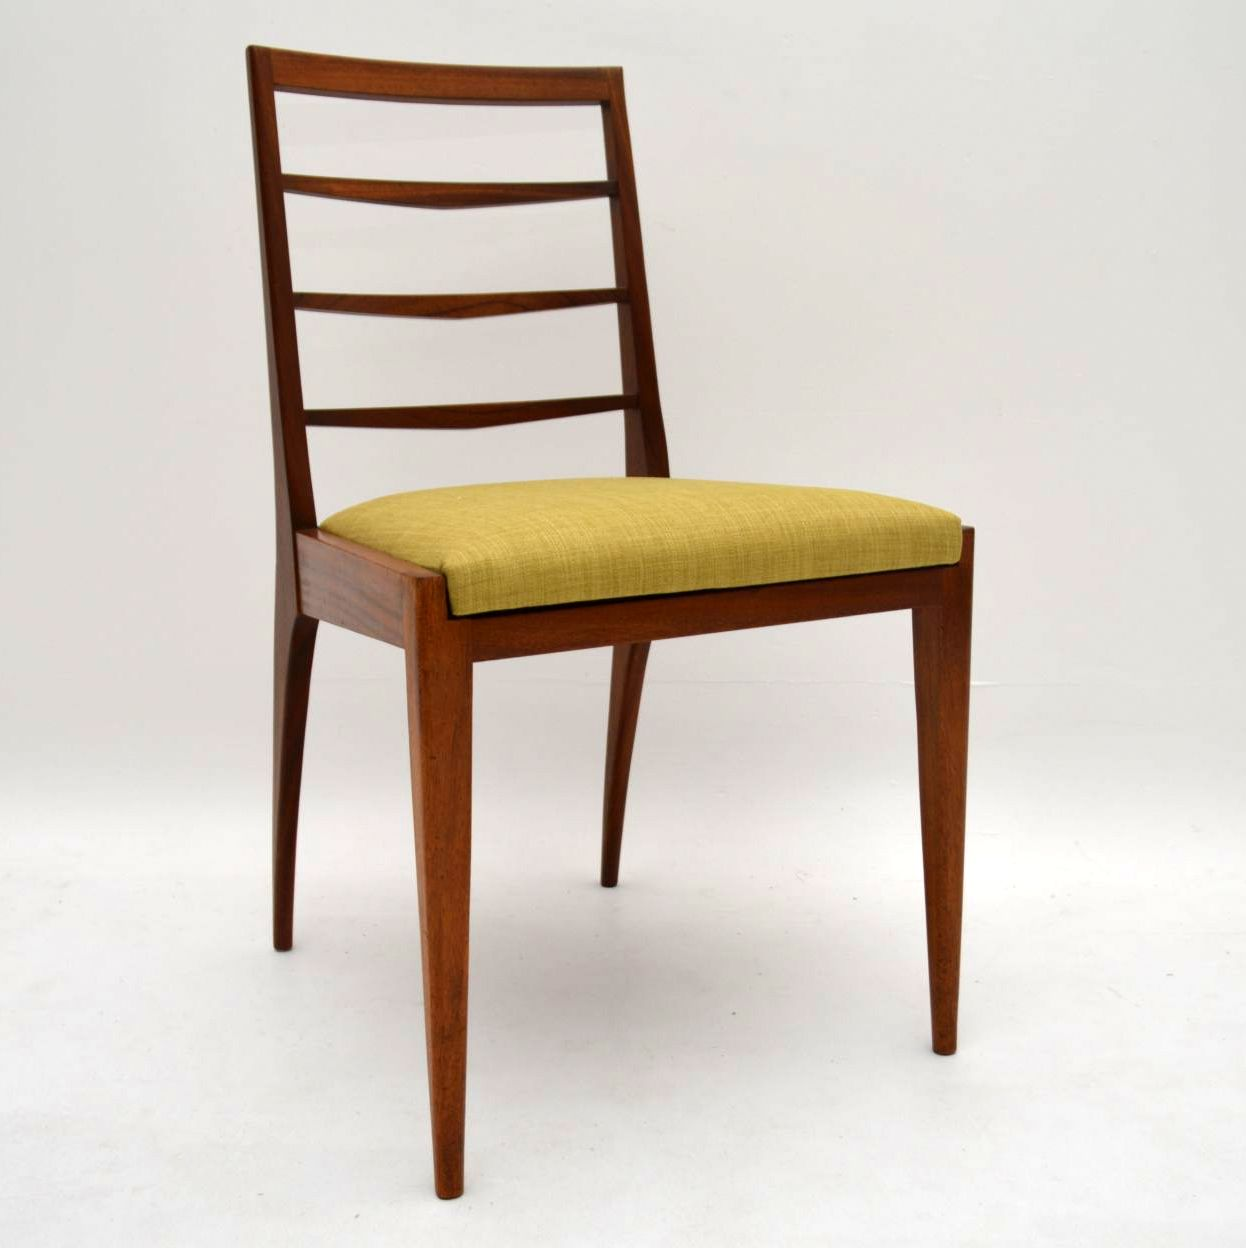 Set Of 6 Retro Teak Dining Chairs By McIntosh Vintage 1960